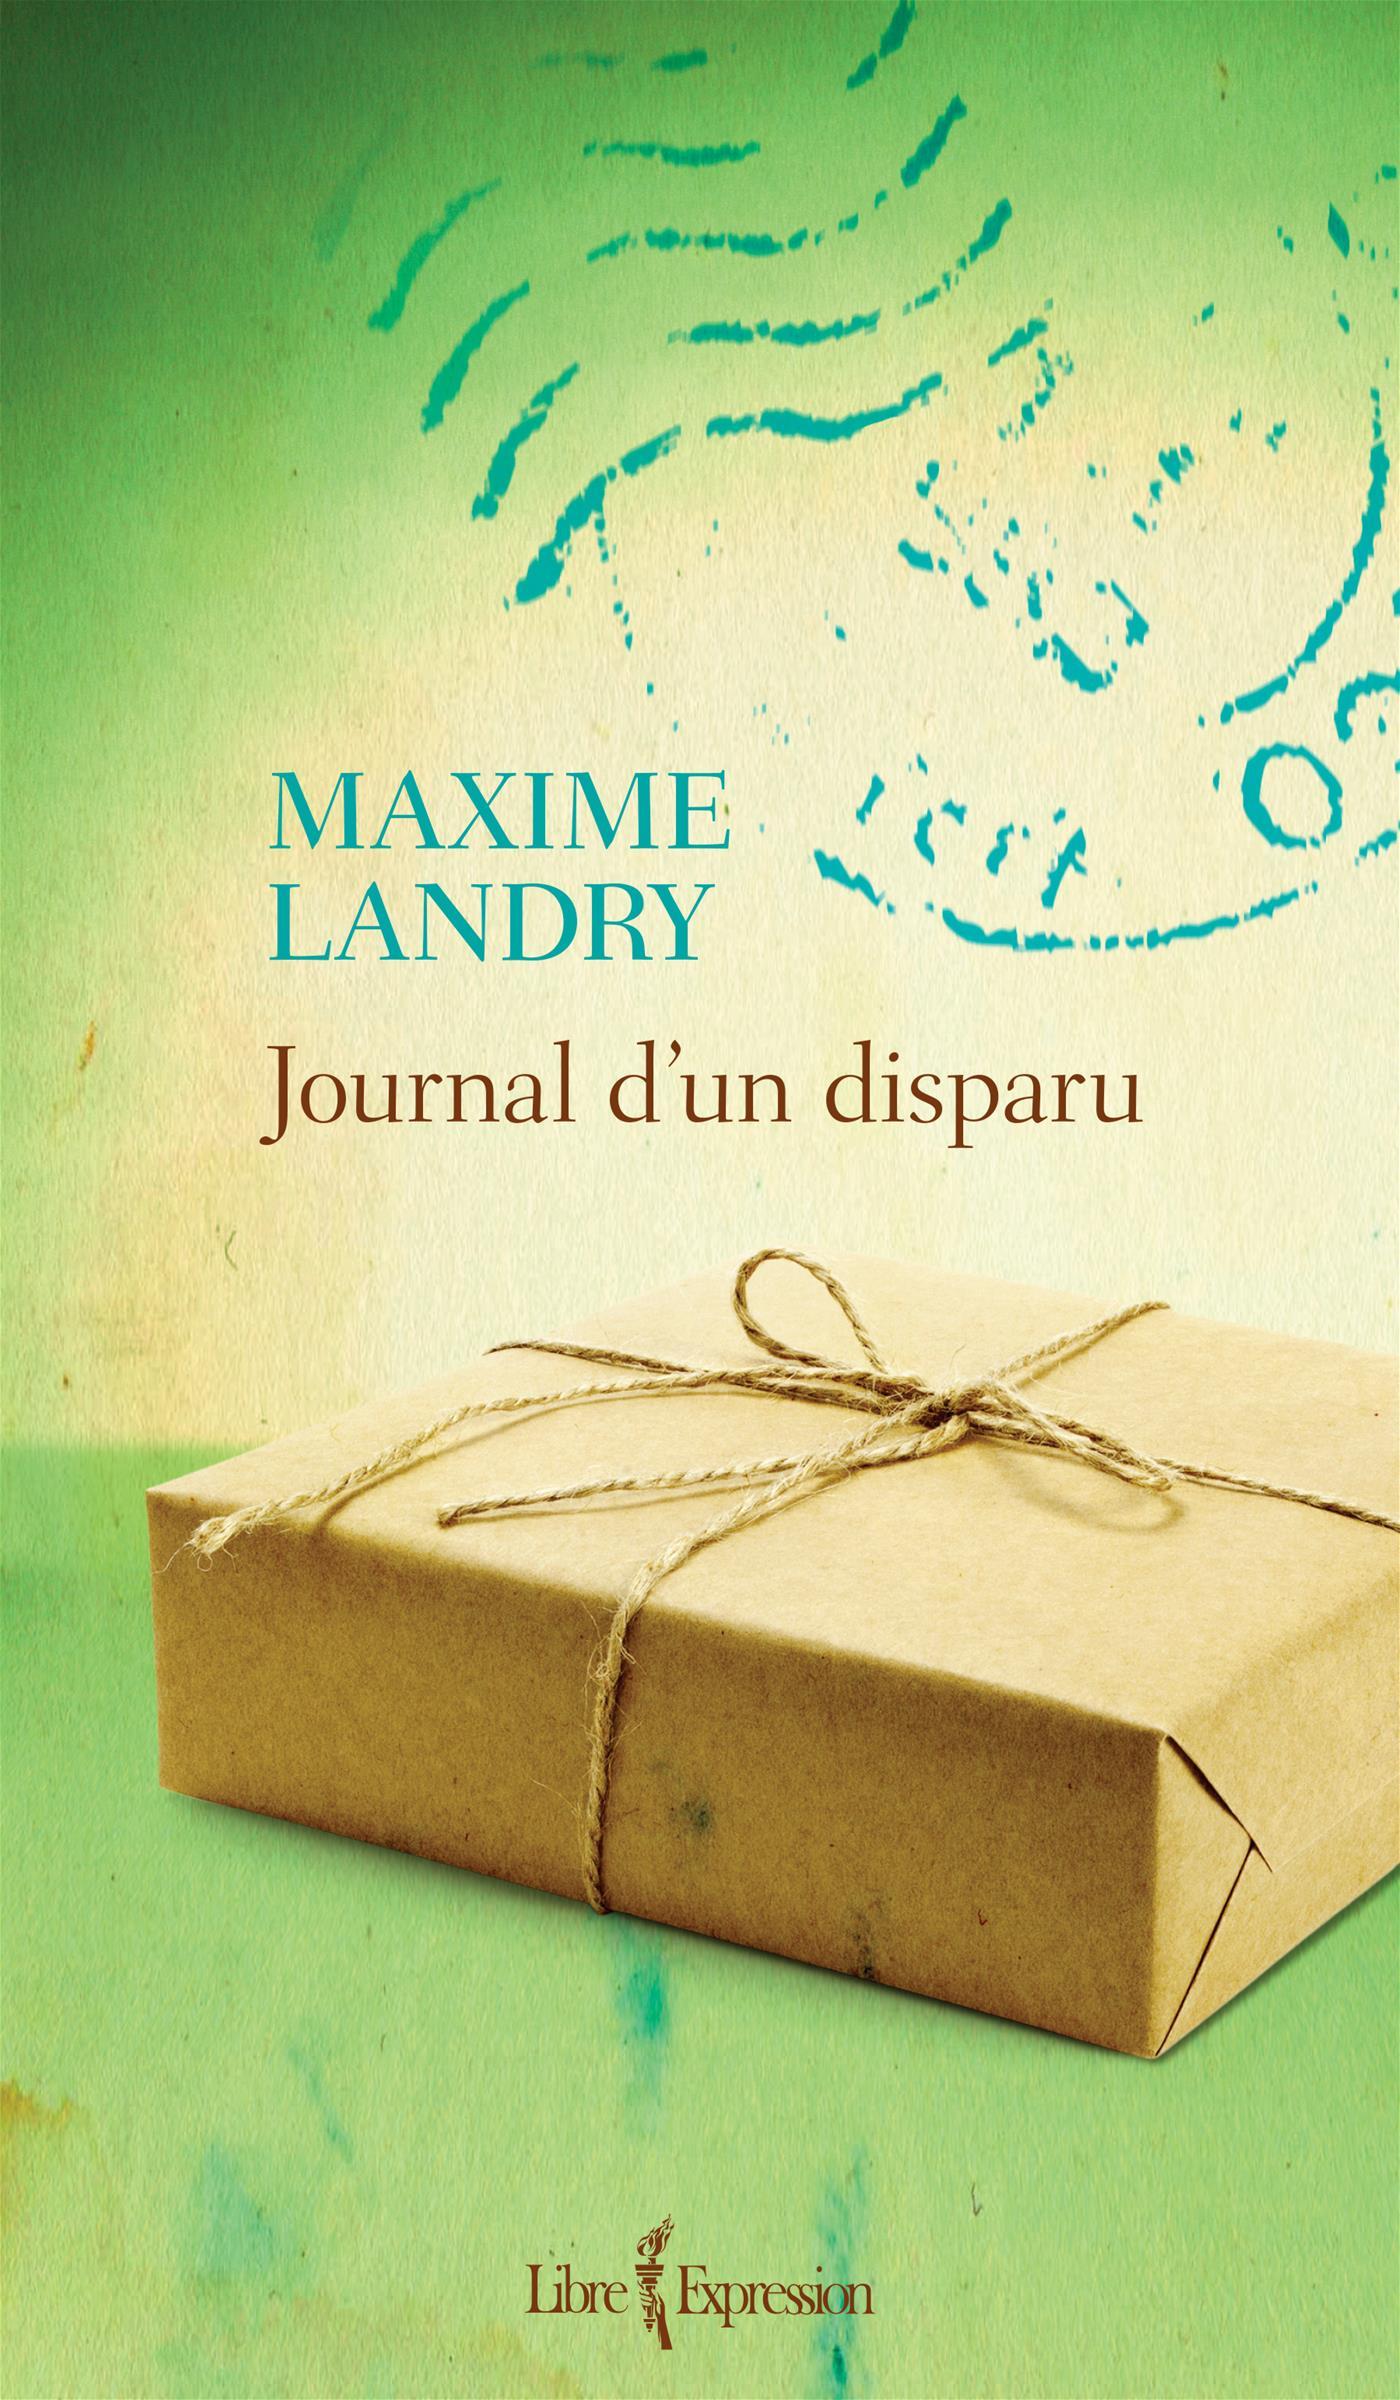 Journal d'un disparu